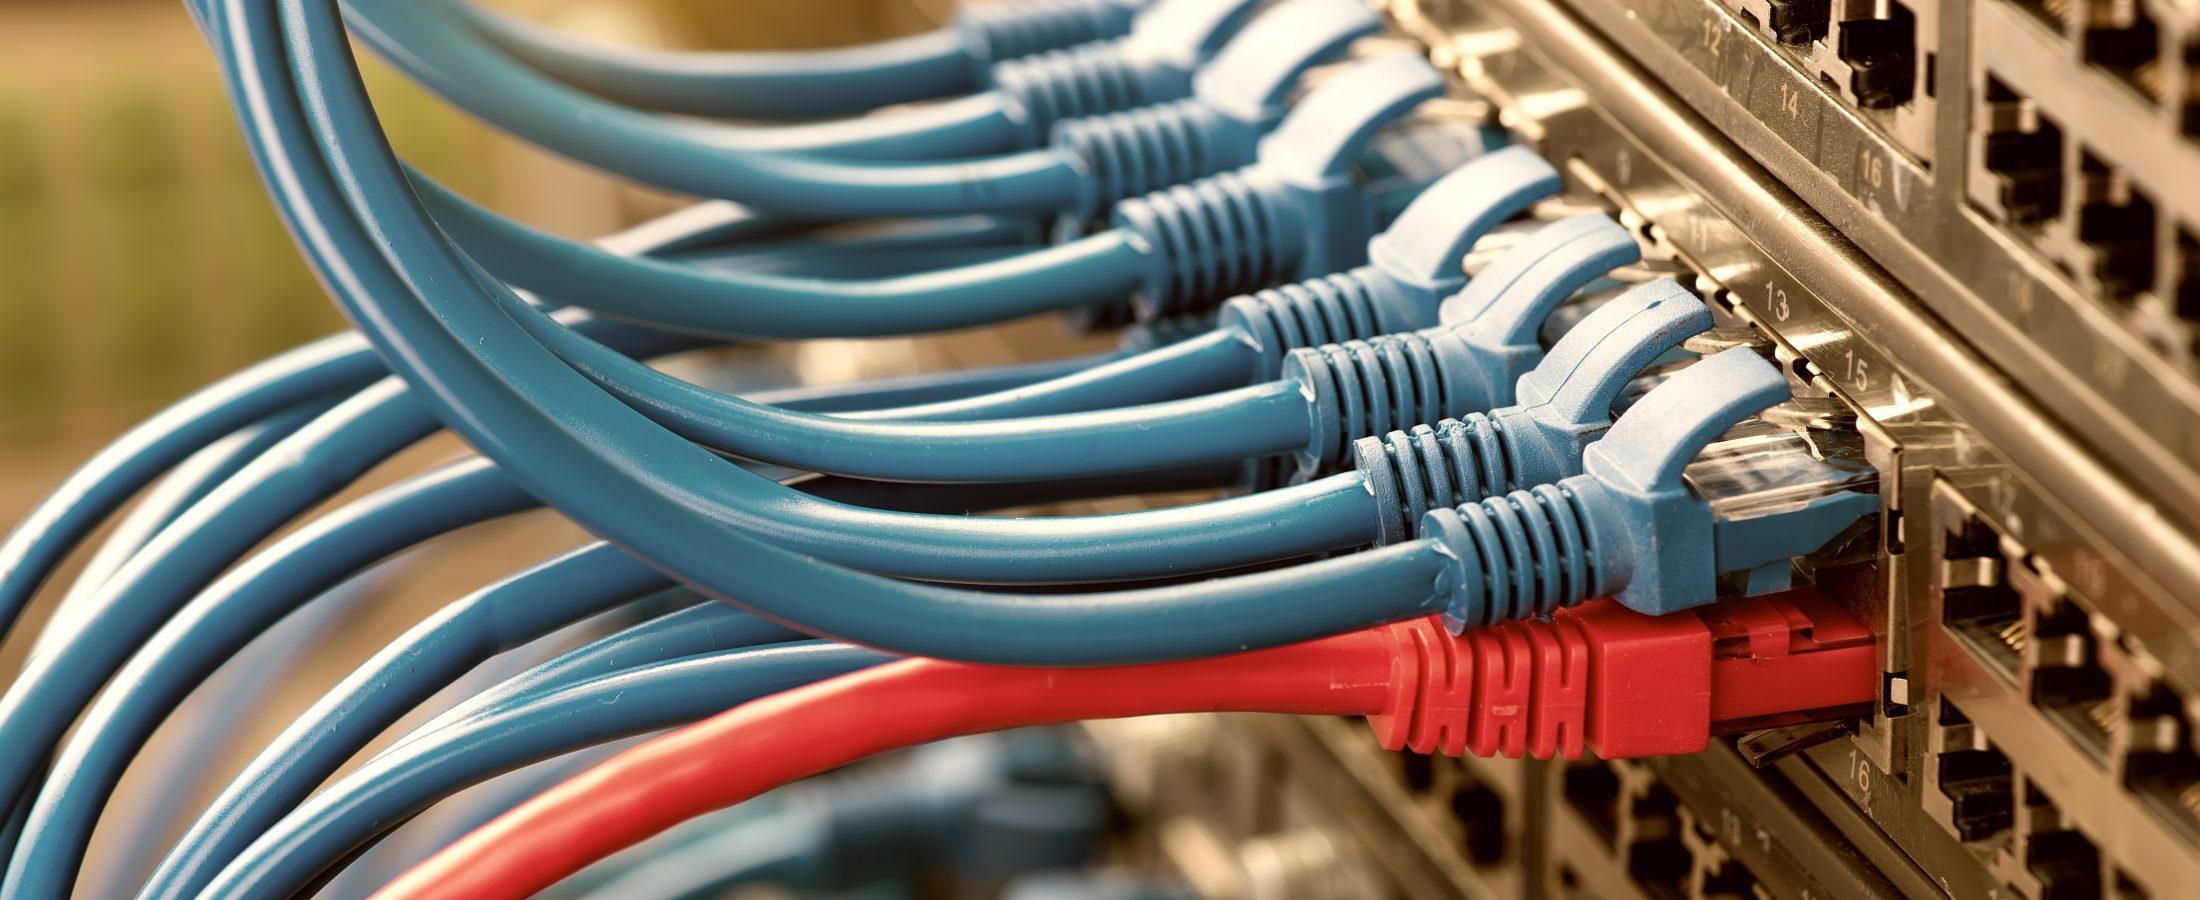 Switcher & nettverksutstyr